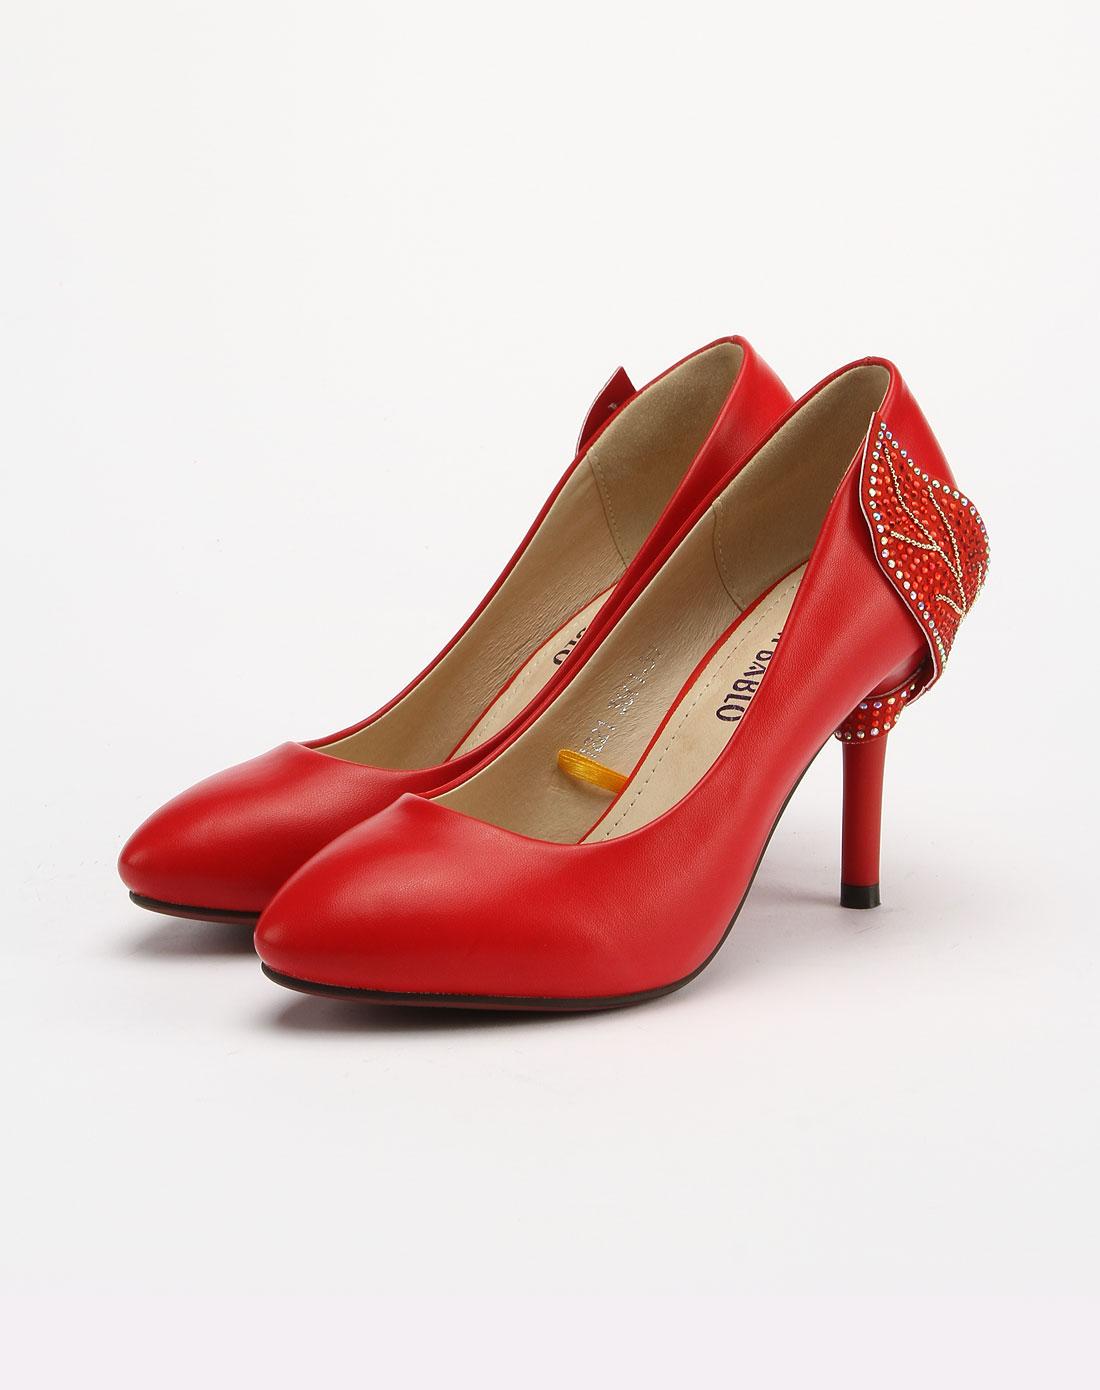 bablo烫钻简约气质红色细高跟鞋b21221-红色